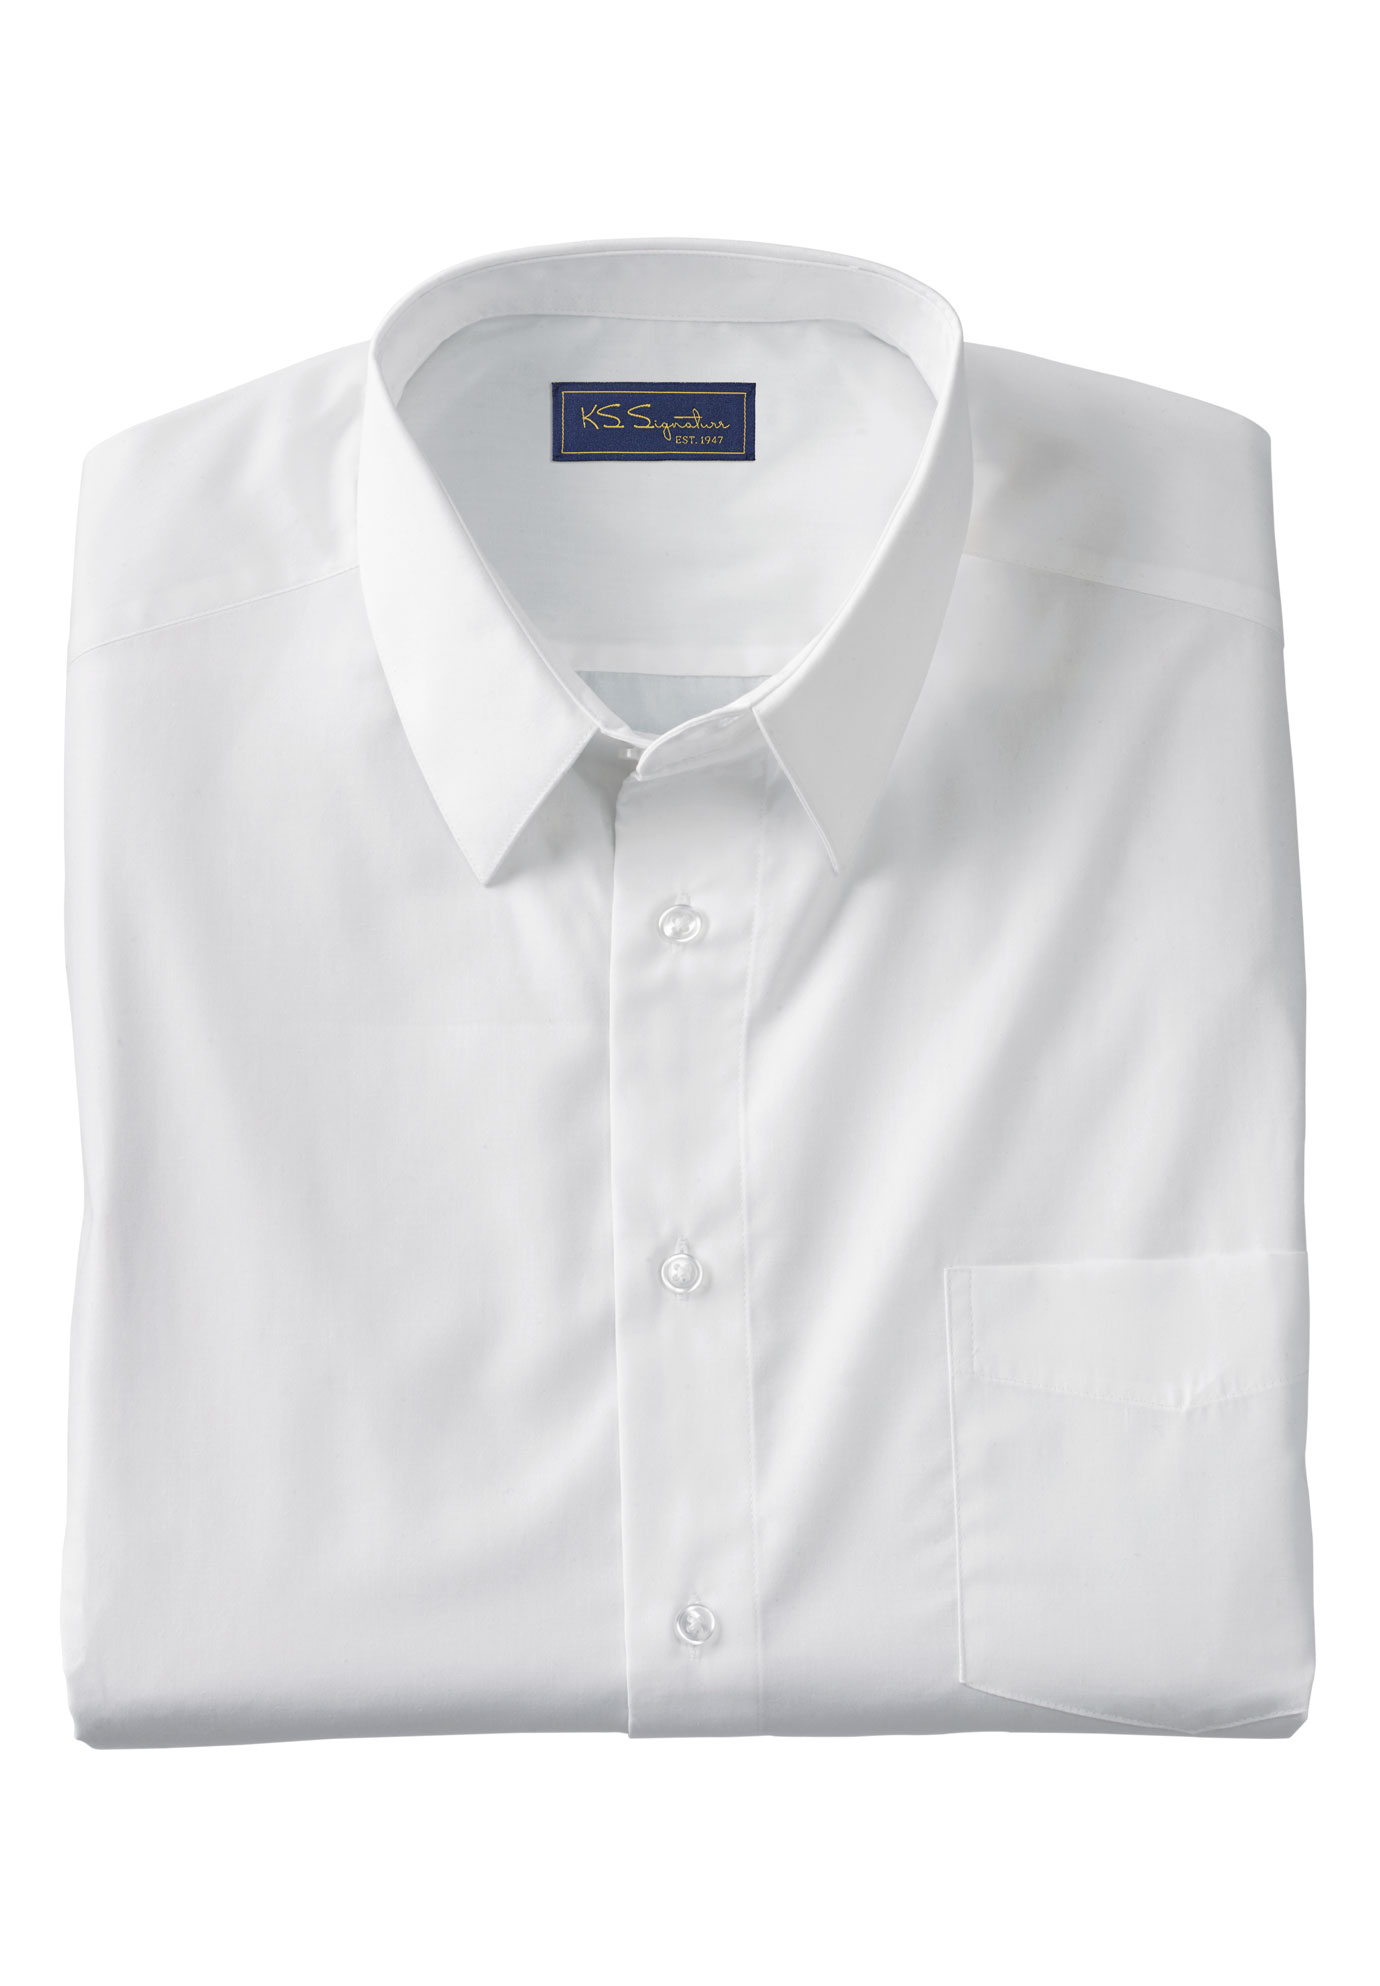 KS Signature by Kingsize Mens Big /& Tall No Hassle Long-Sleeve Dress Shirt